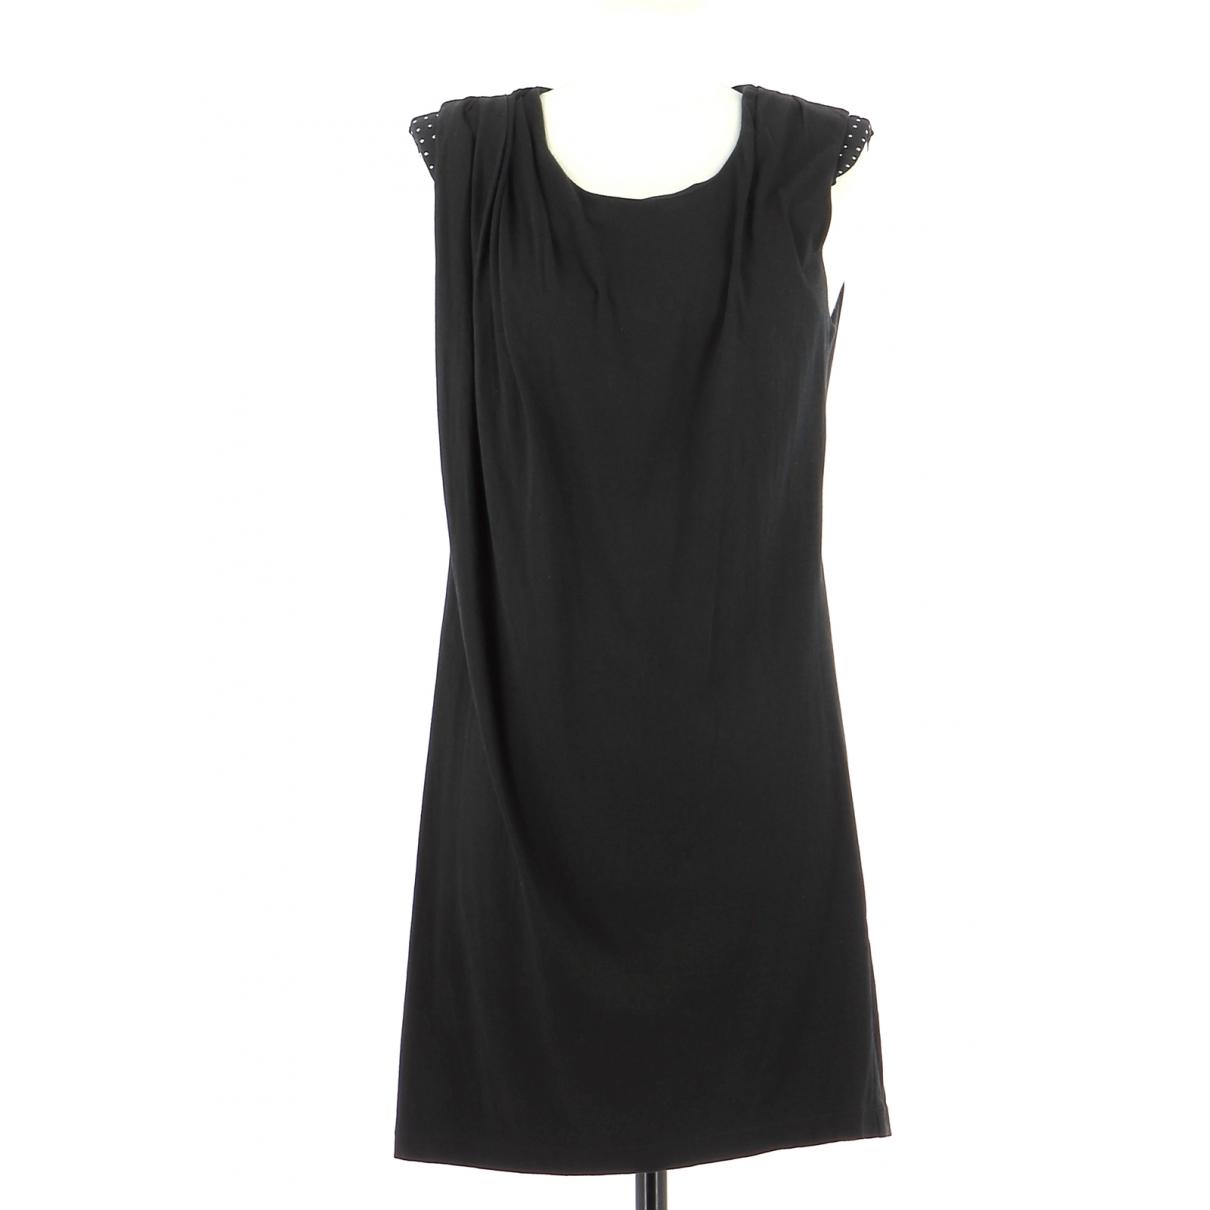 Maje \N Black dress for Women 38 FR